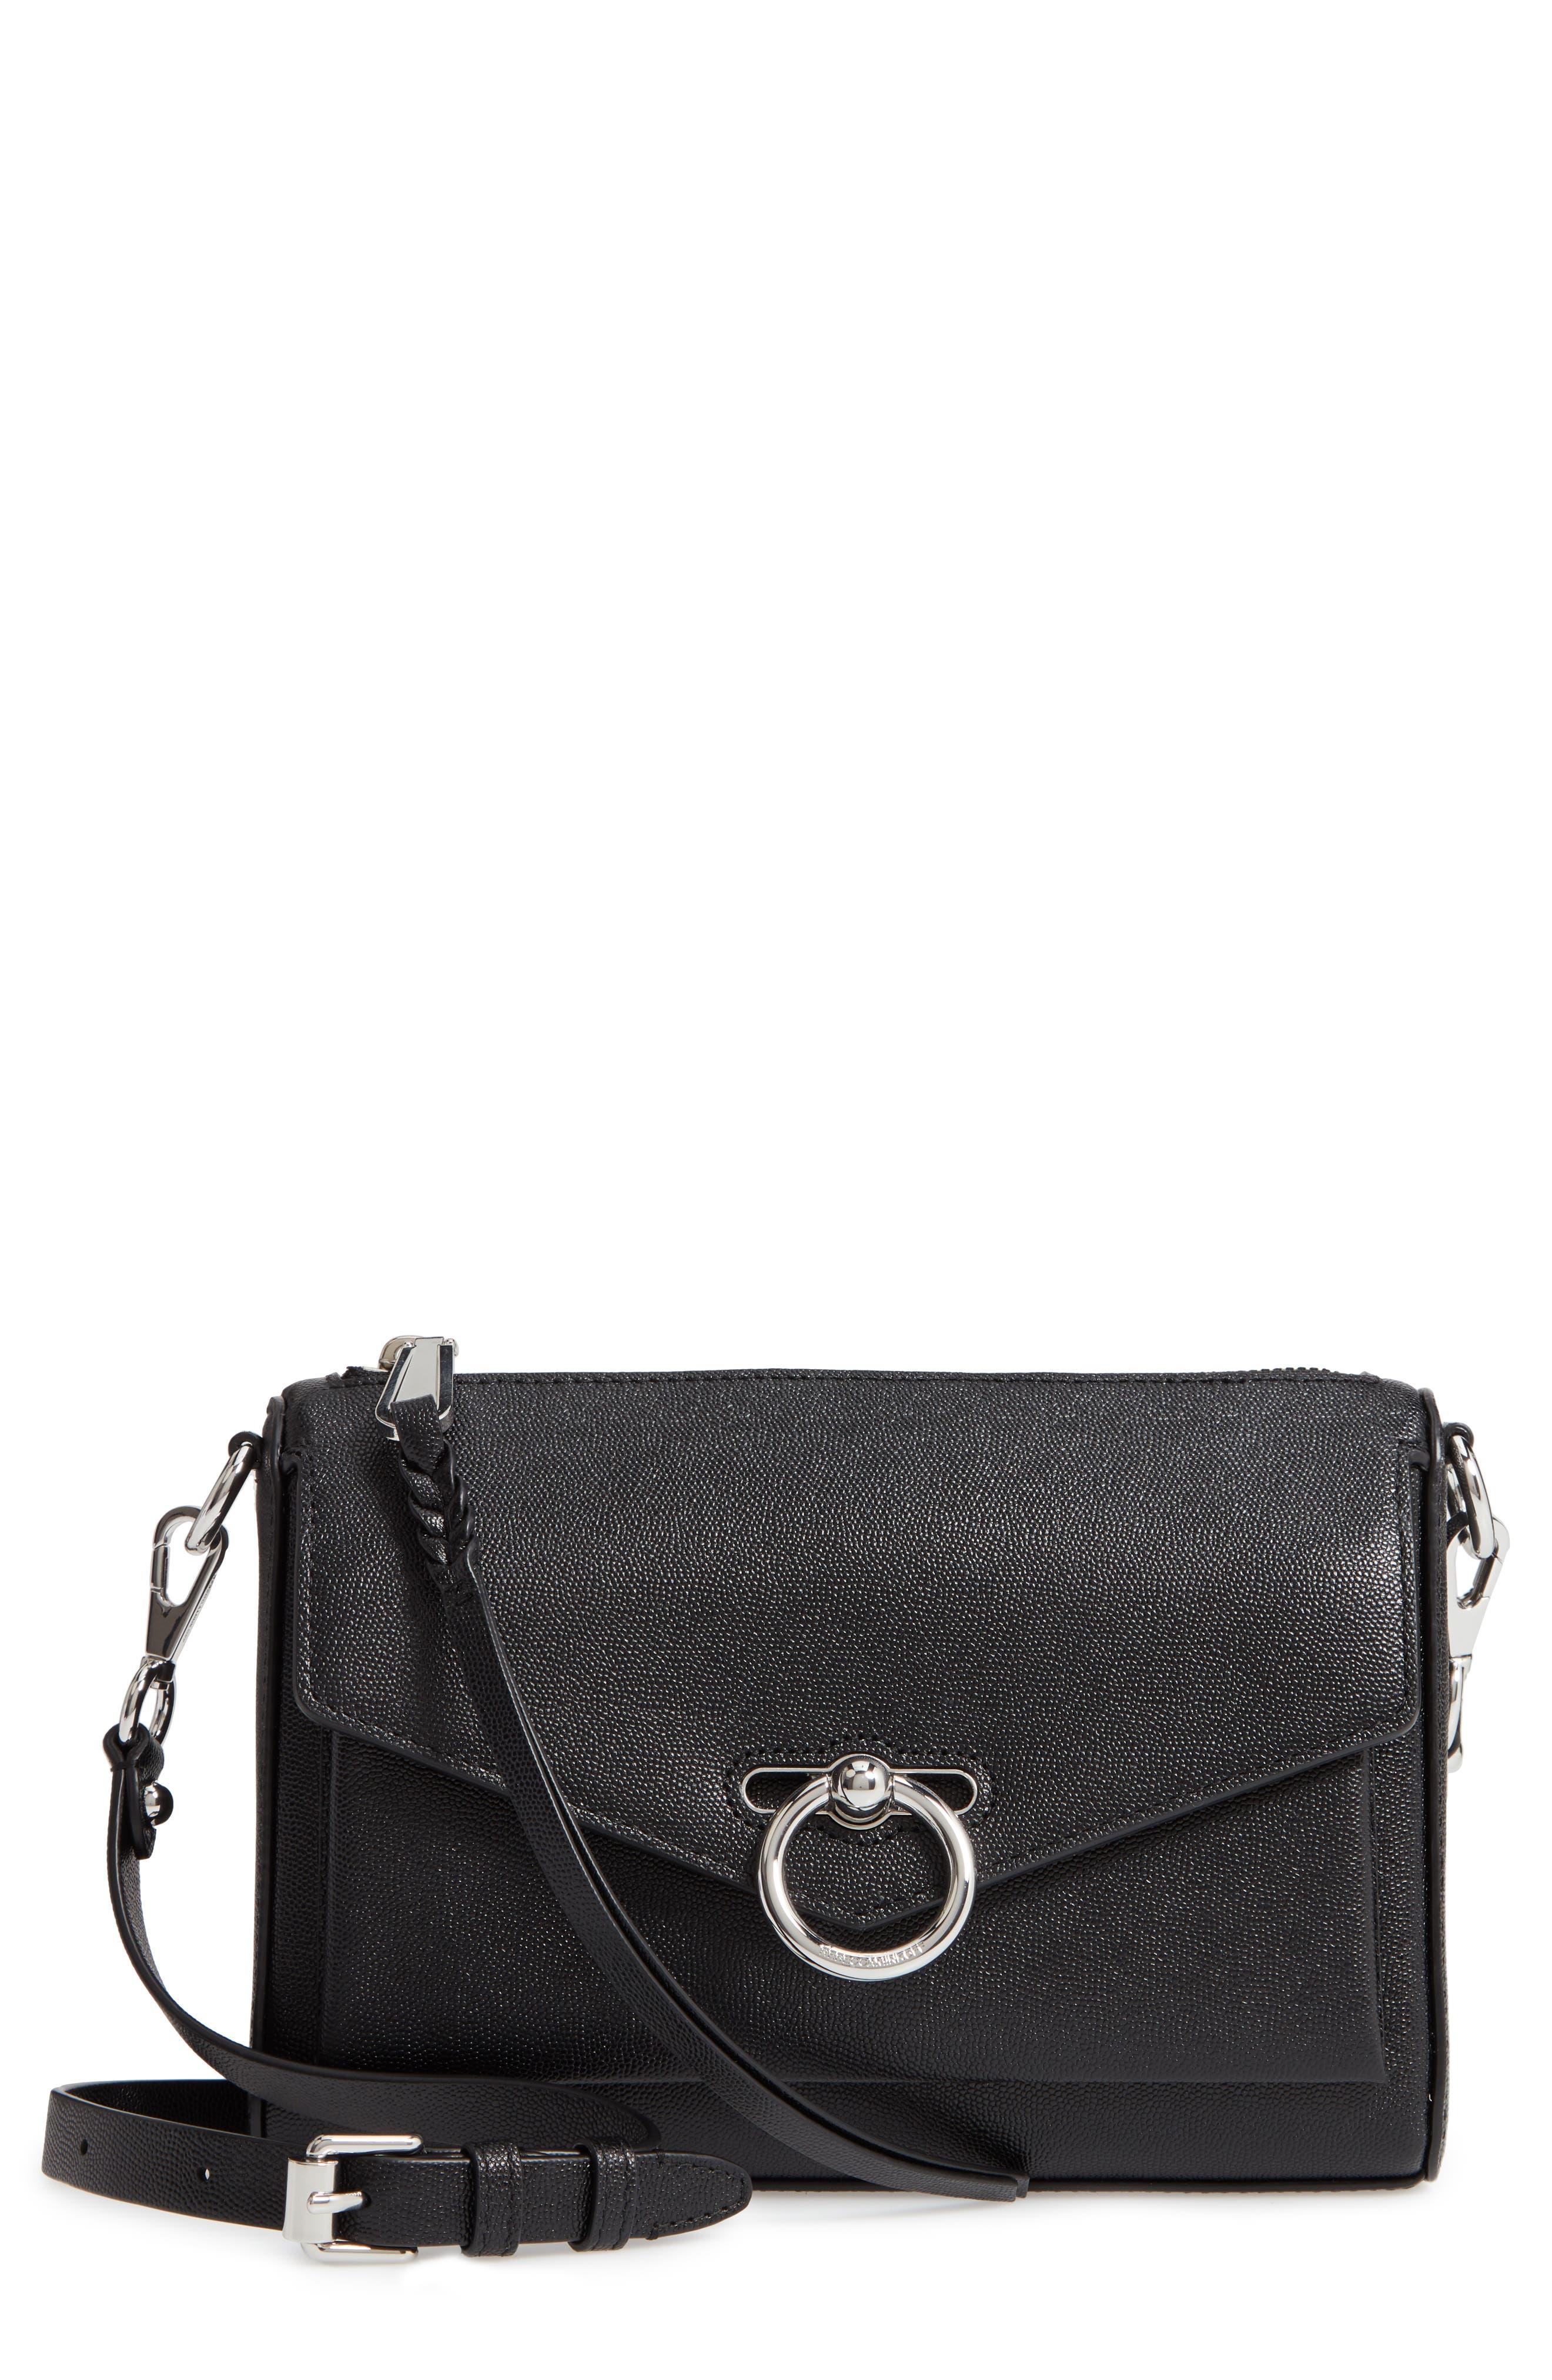 REBECCA MINKOFF, Jean MAC Convertible Crossbody Bag, Main thumbnail 1, color, BLACK